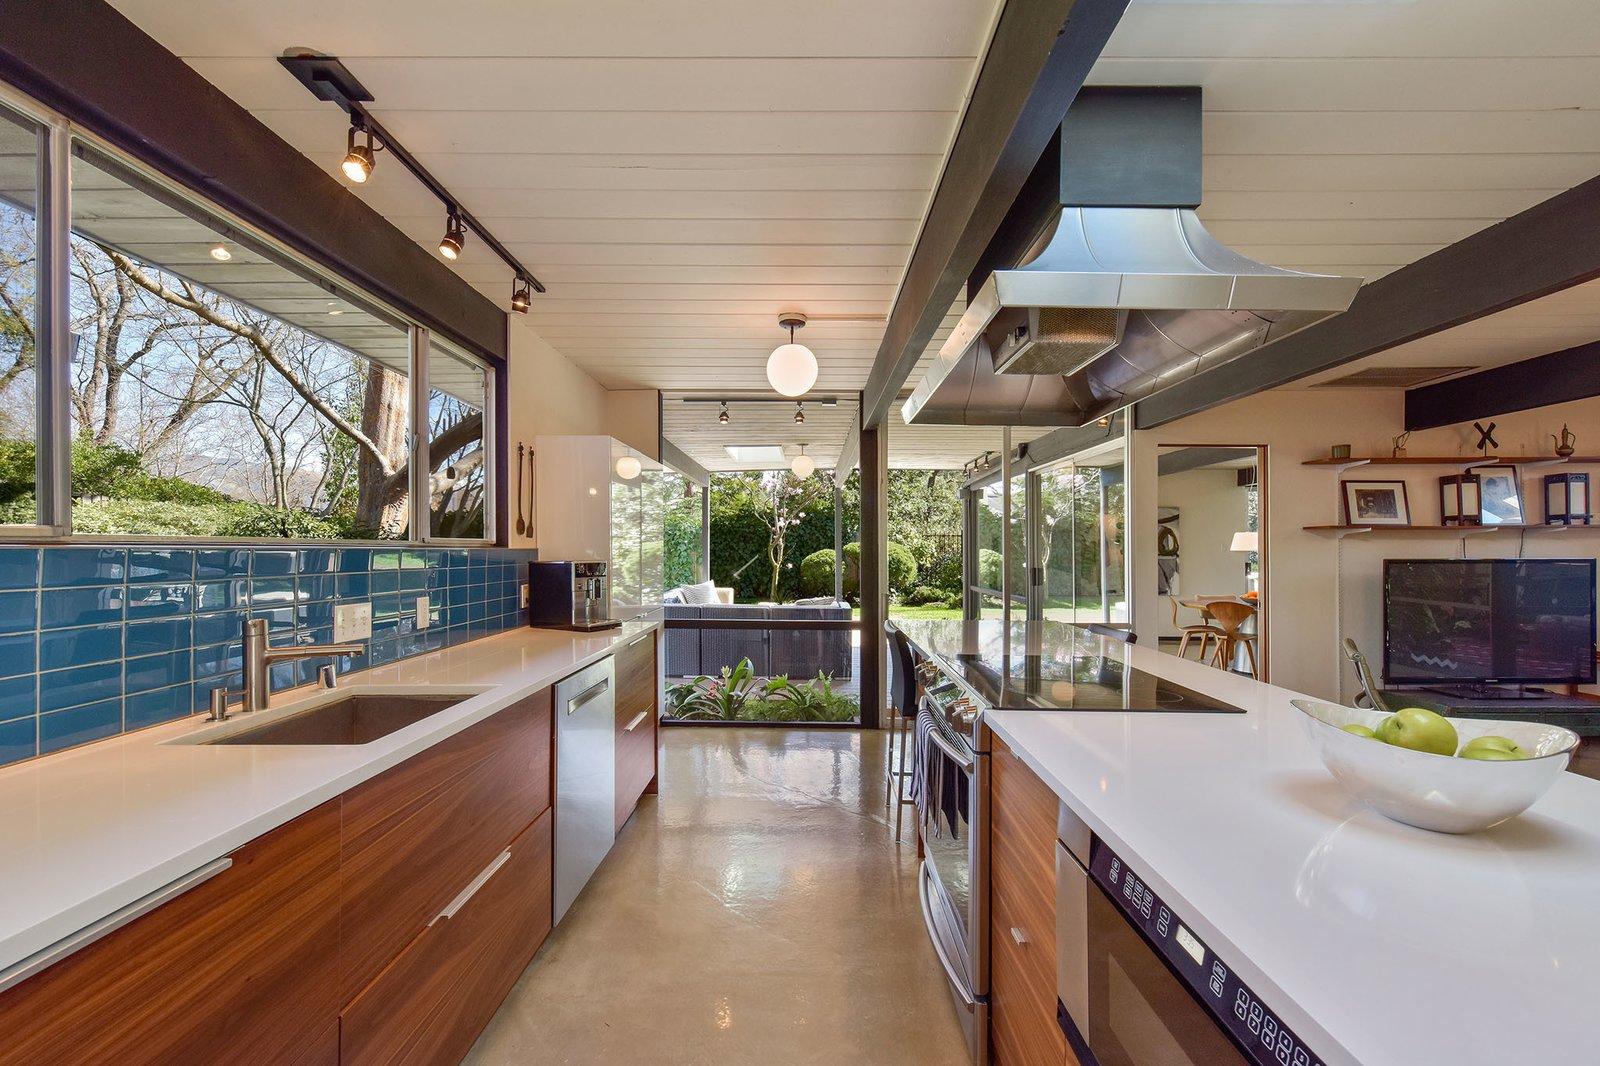 Model 14 Eichler kitchen